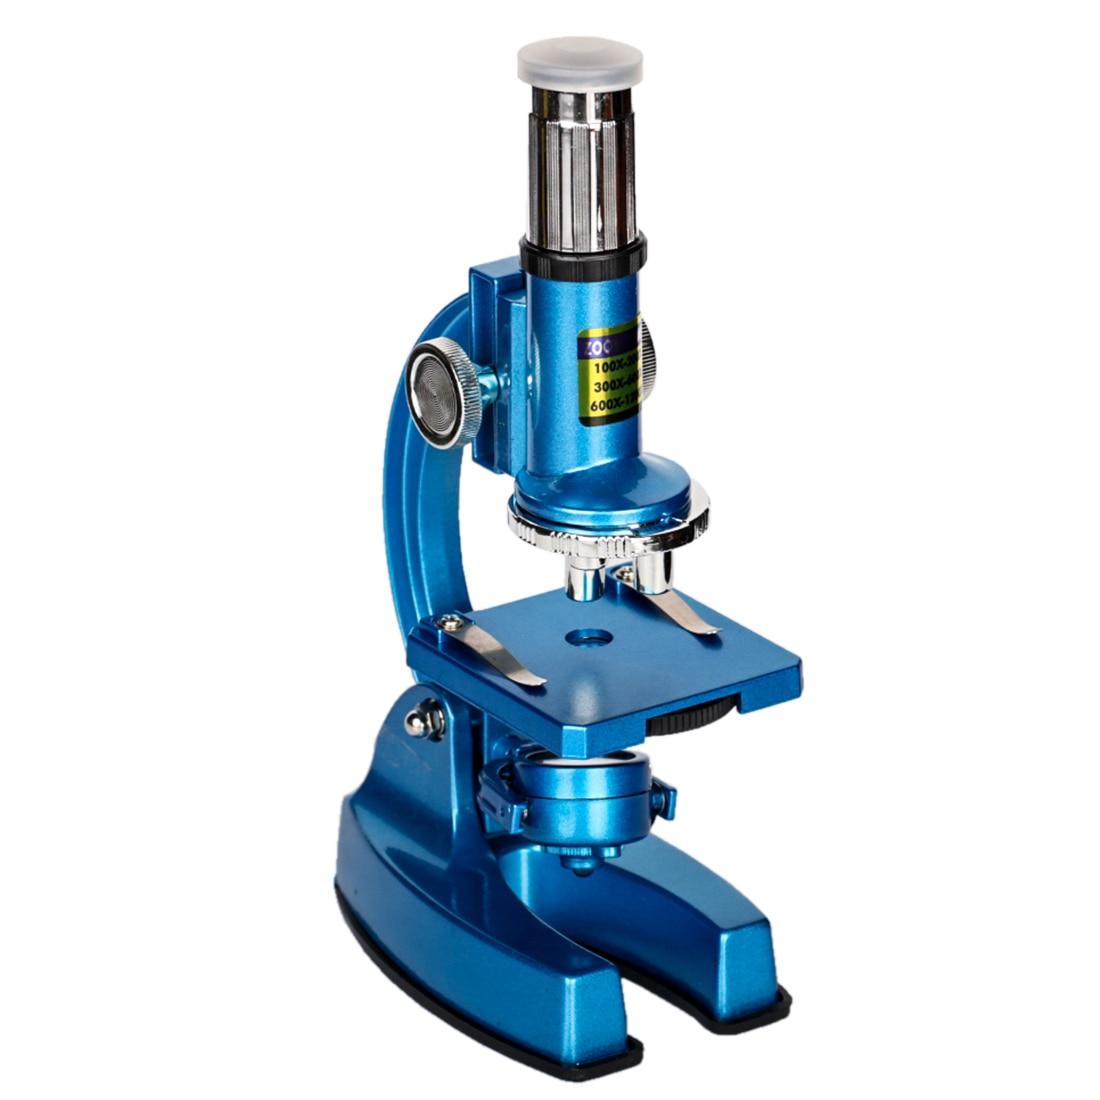 DIY 100X 200X 300X 600X 1200X Hd gran angular microscopio óptico puzle análisis celular equipo Experimental Stem Toy para niños - 2